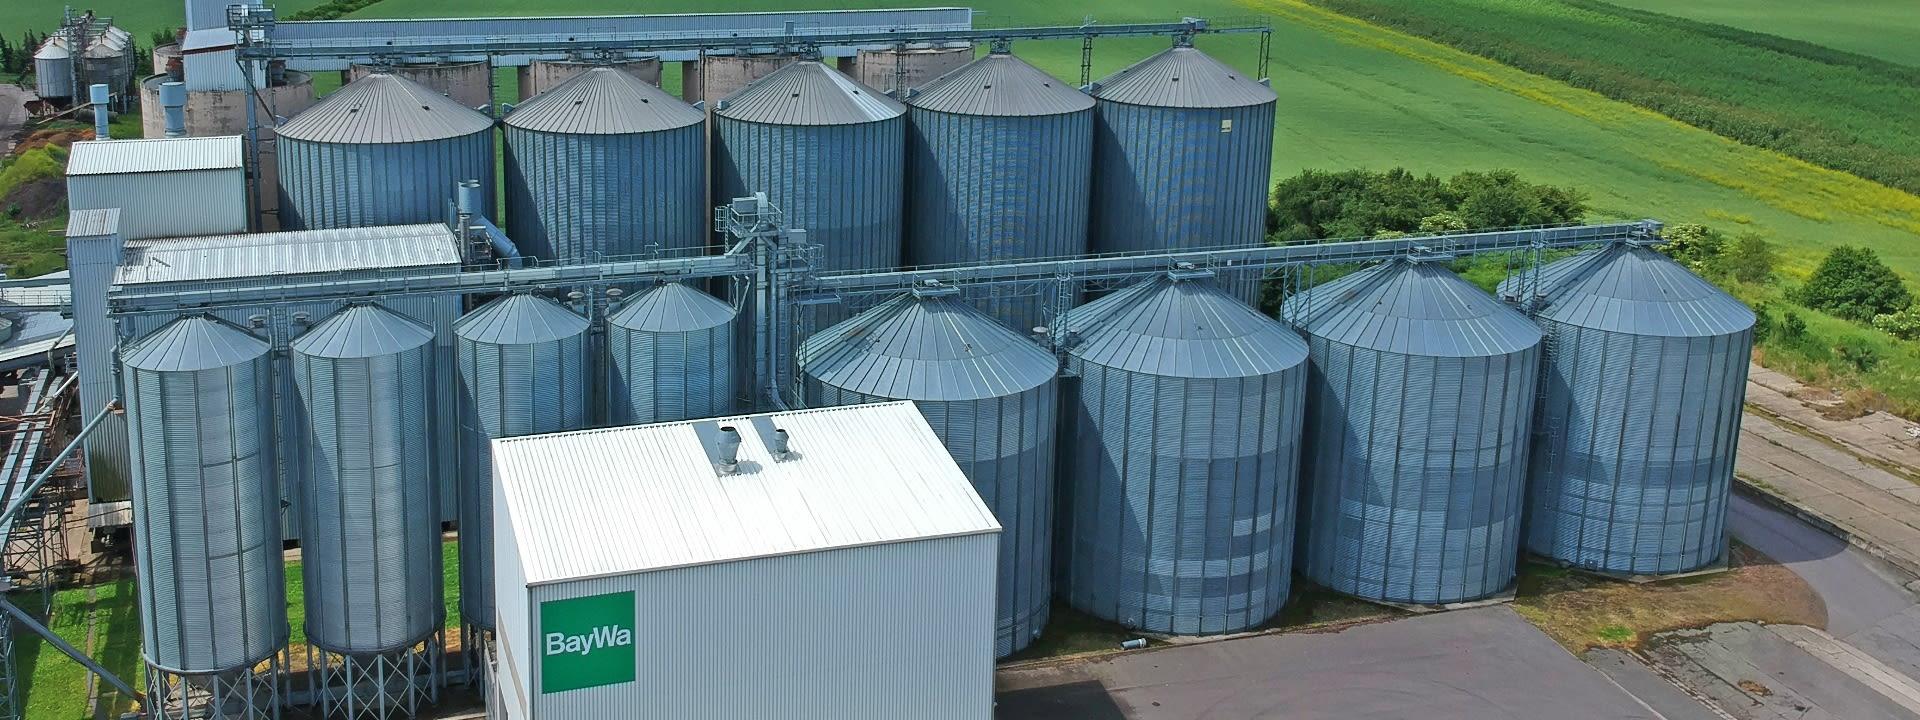 BayWa Agrar Freiberg-Großschirma